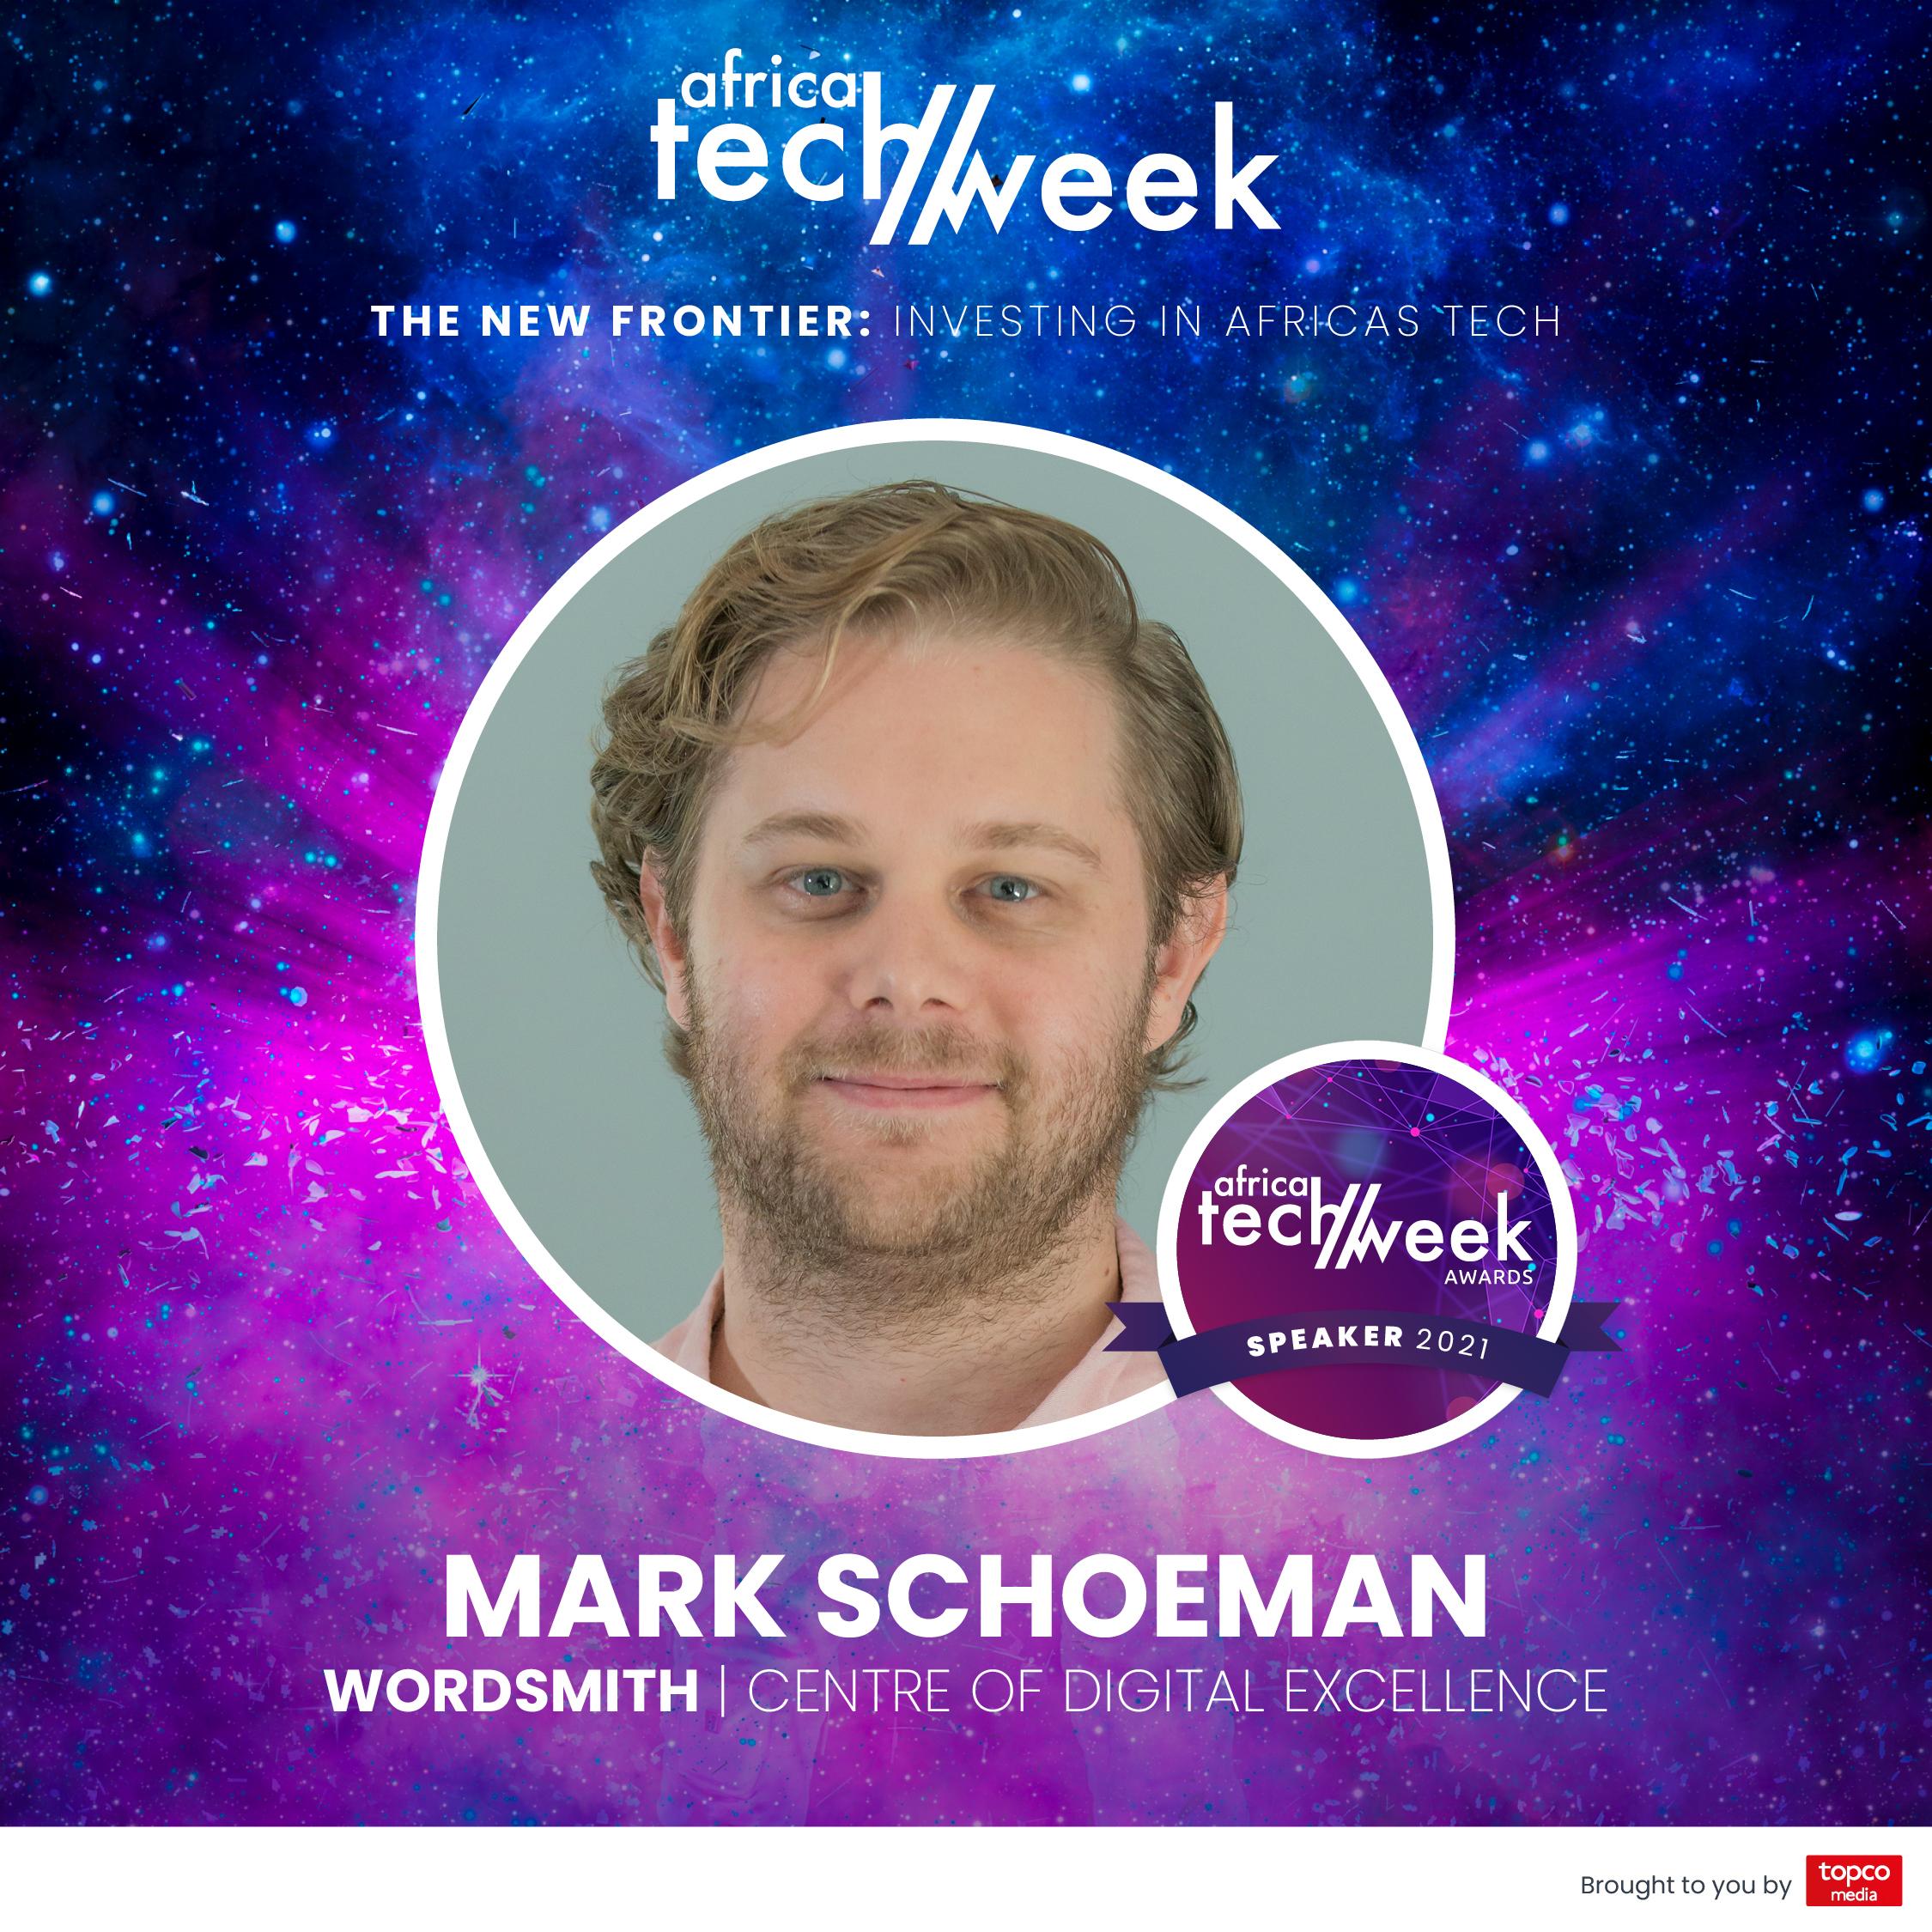 Mark Schoeman